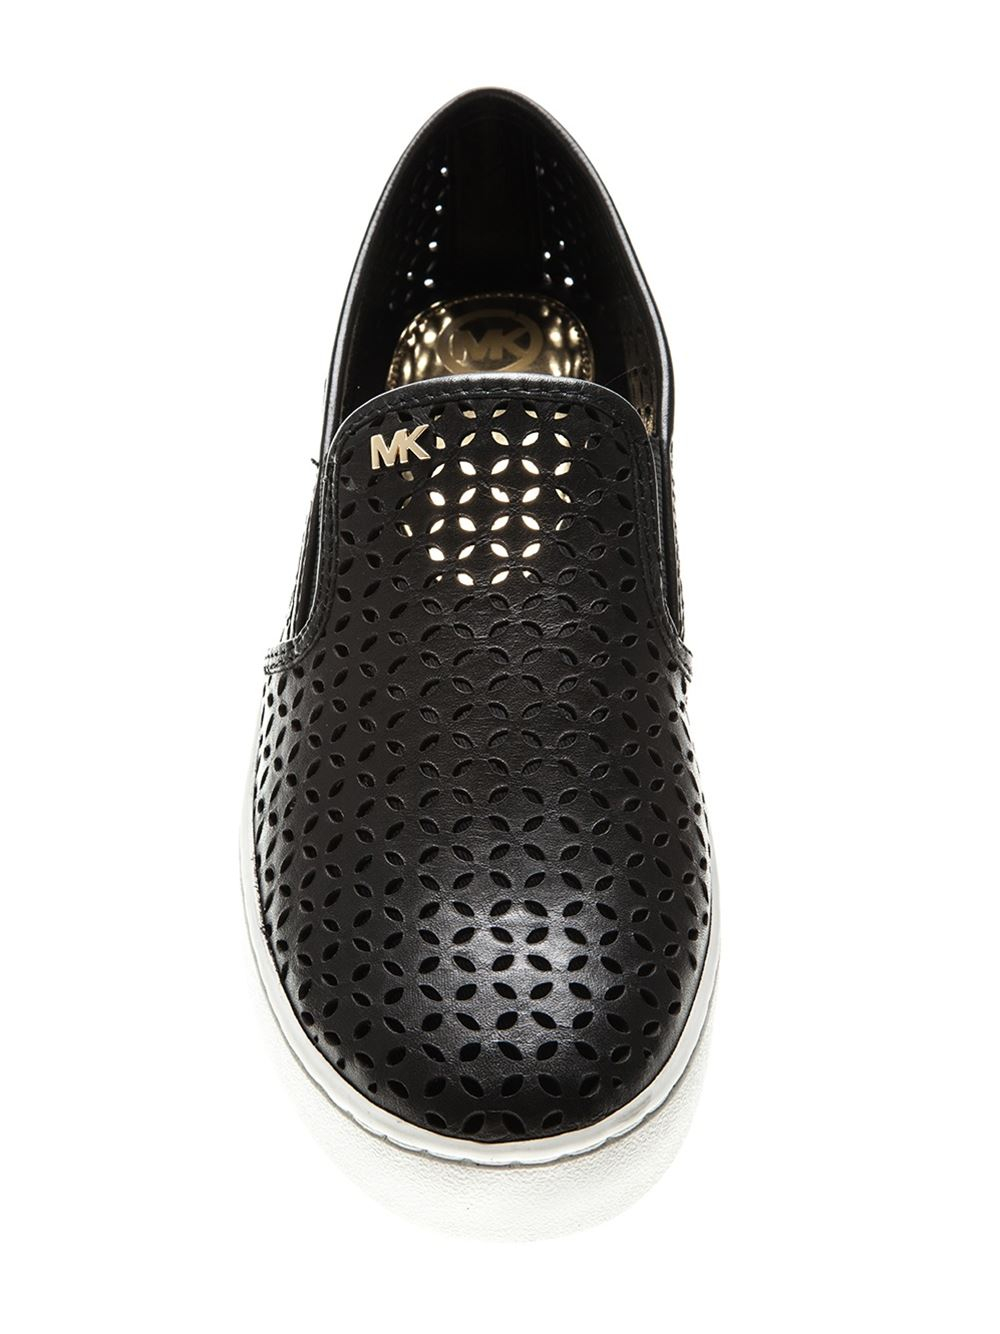 ba1ea1e2 MICHAEL Michael Kors 'olivia' Perforated Slip-on Sneakers in Black ...